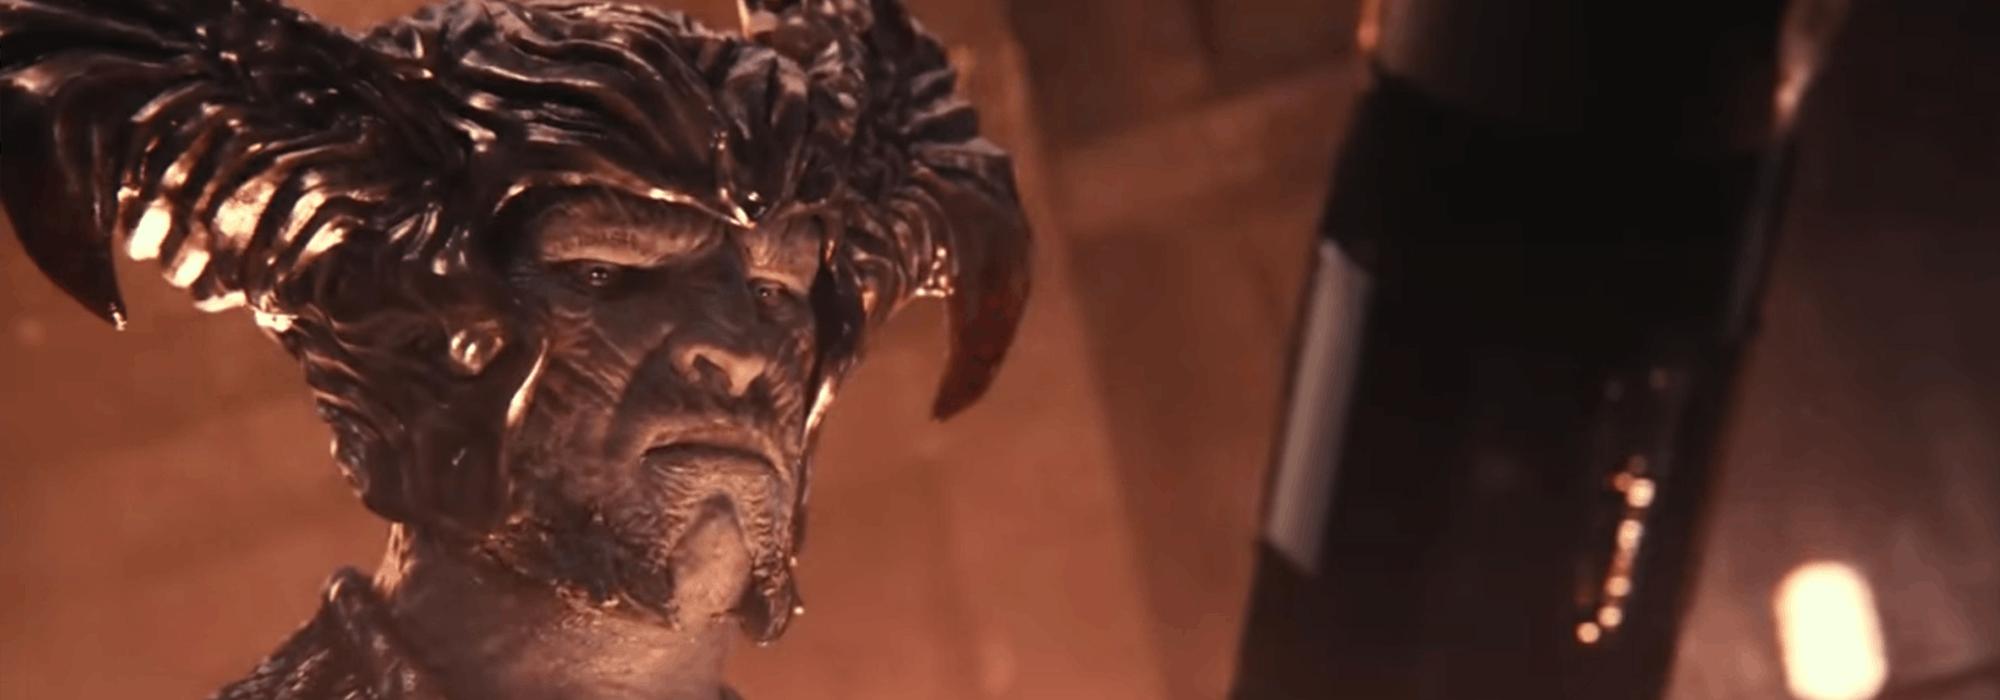 Steppenwolf dans Justice League